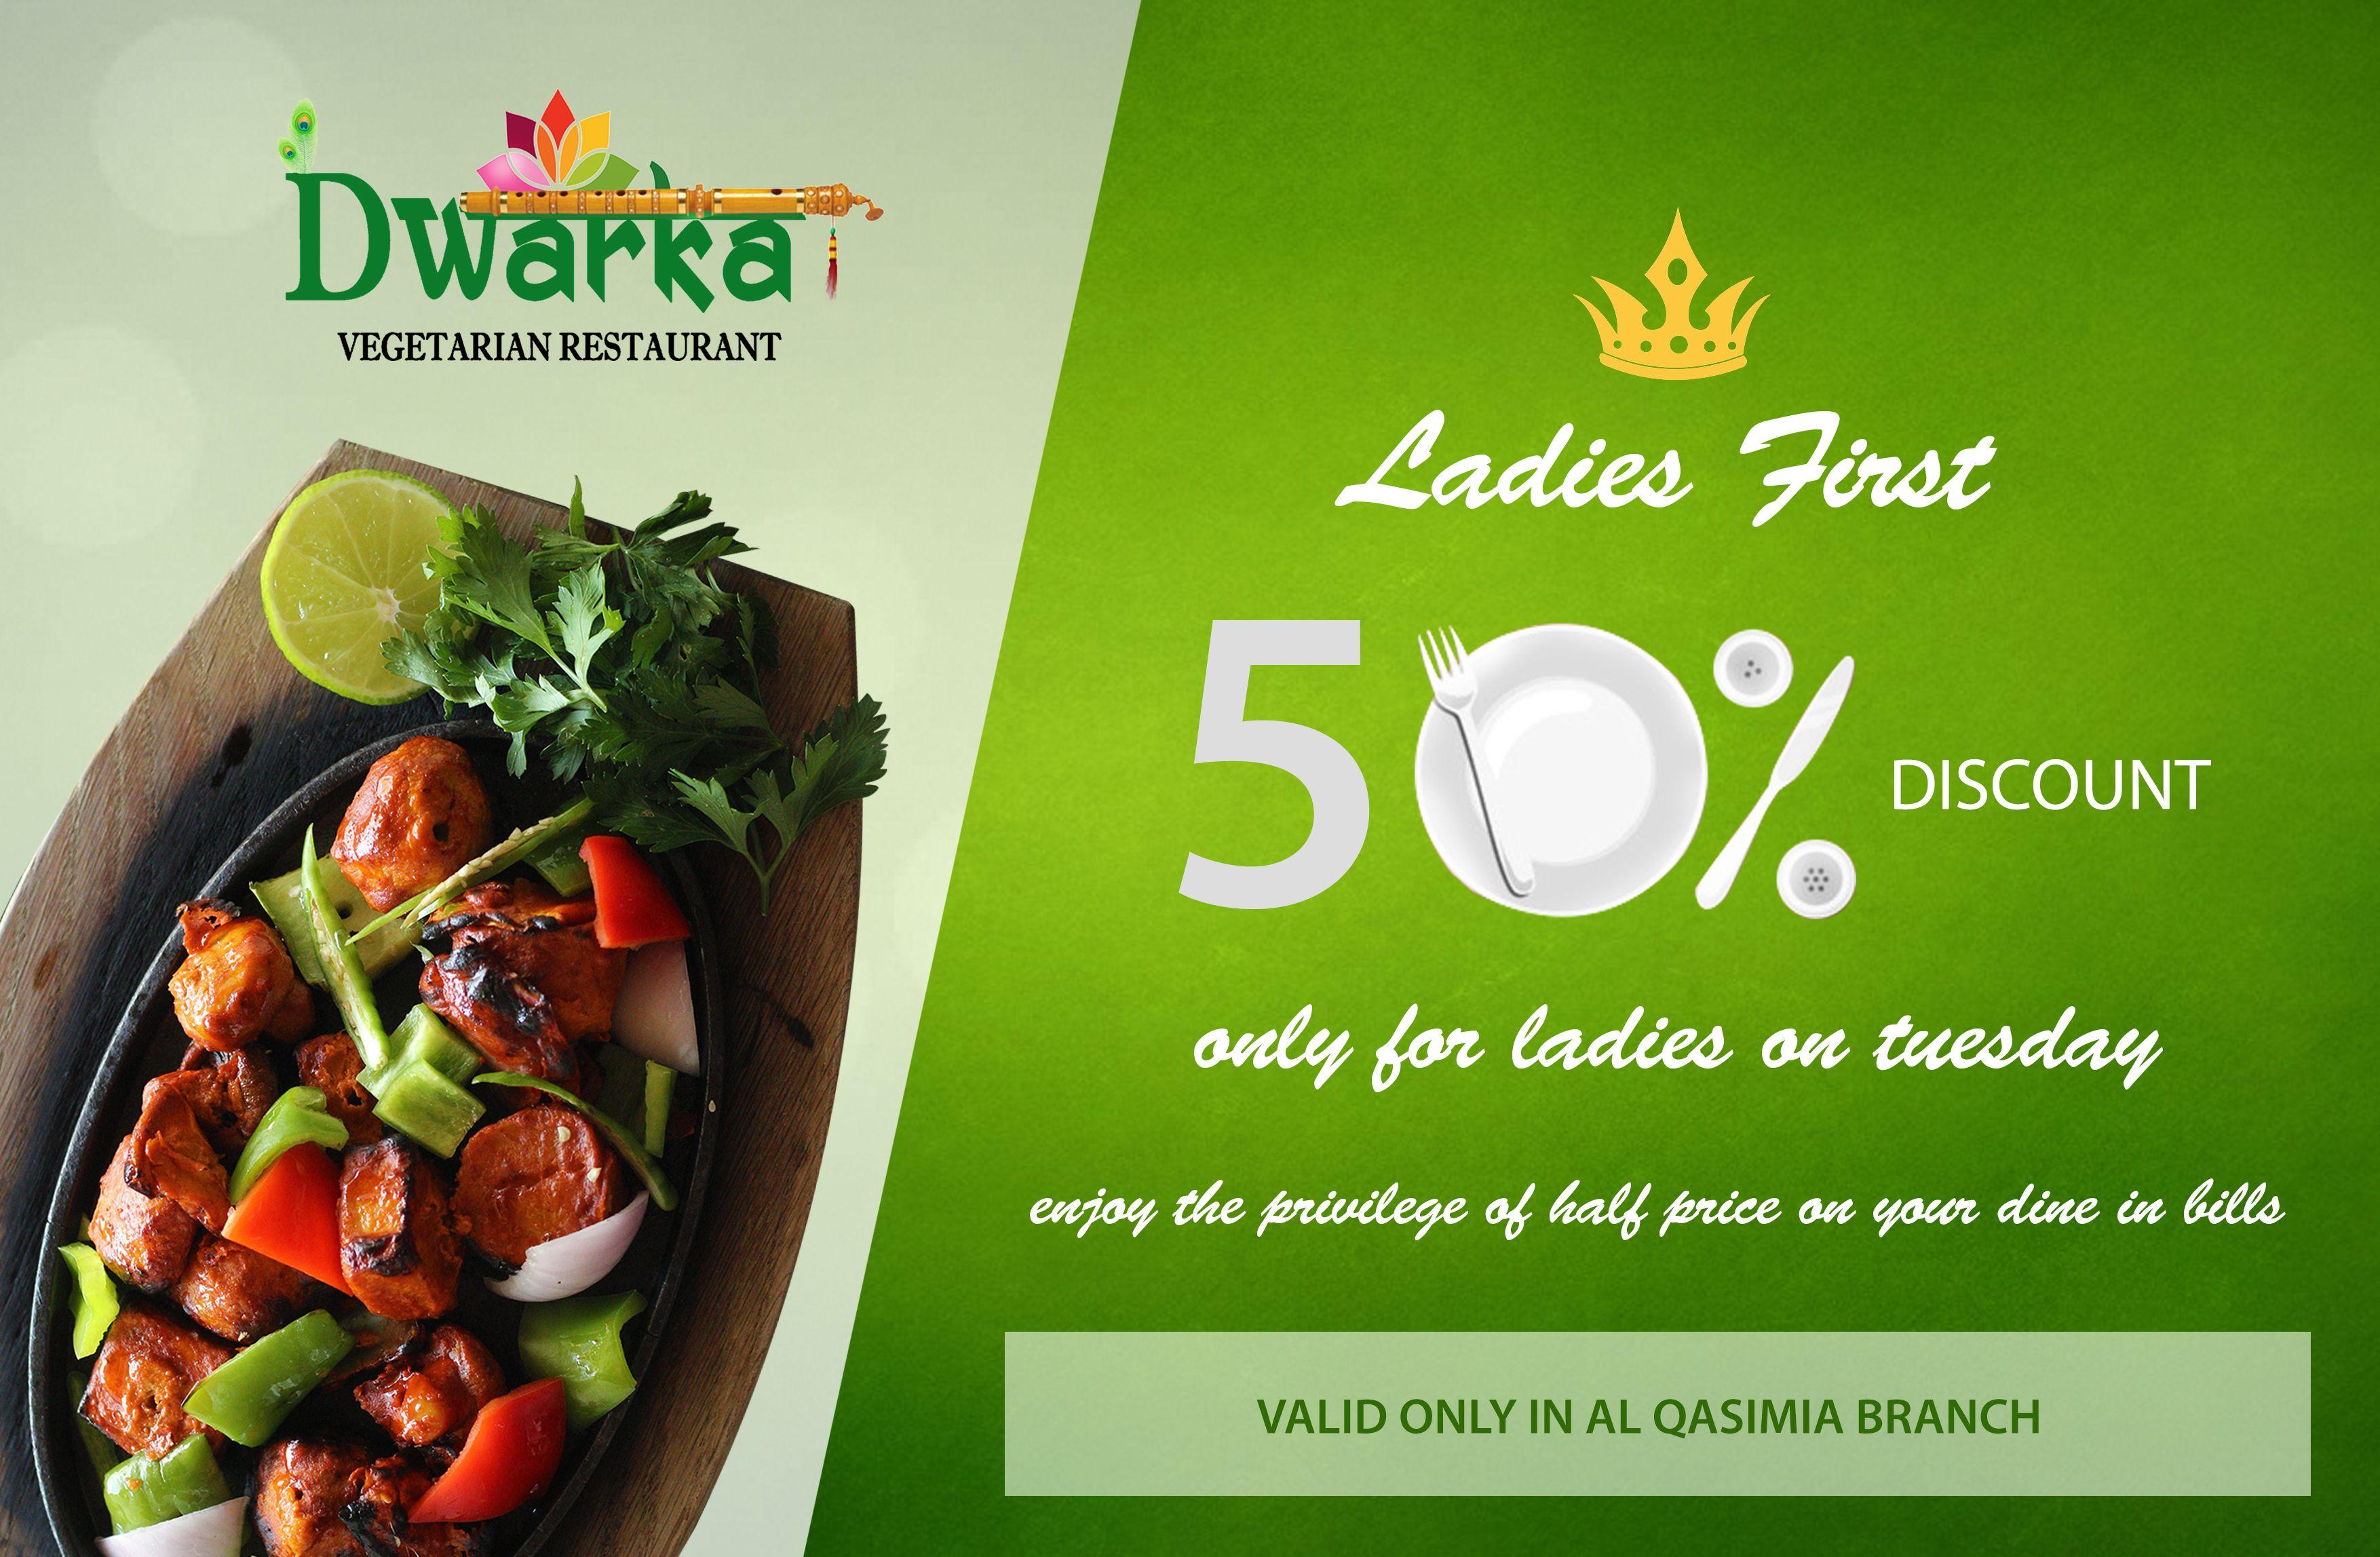 Dwarka Vegetarian Restaurant 50 Discount For Ladies Valid Only In Al Qasimia Branch Www Rainb Veg Restaurant Vegetarian Restaurant Yummy Food